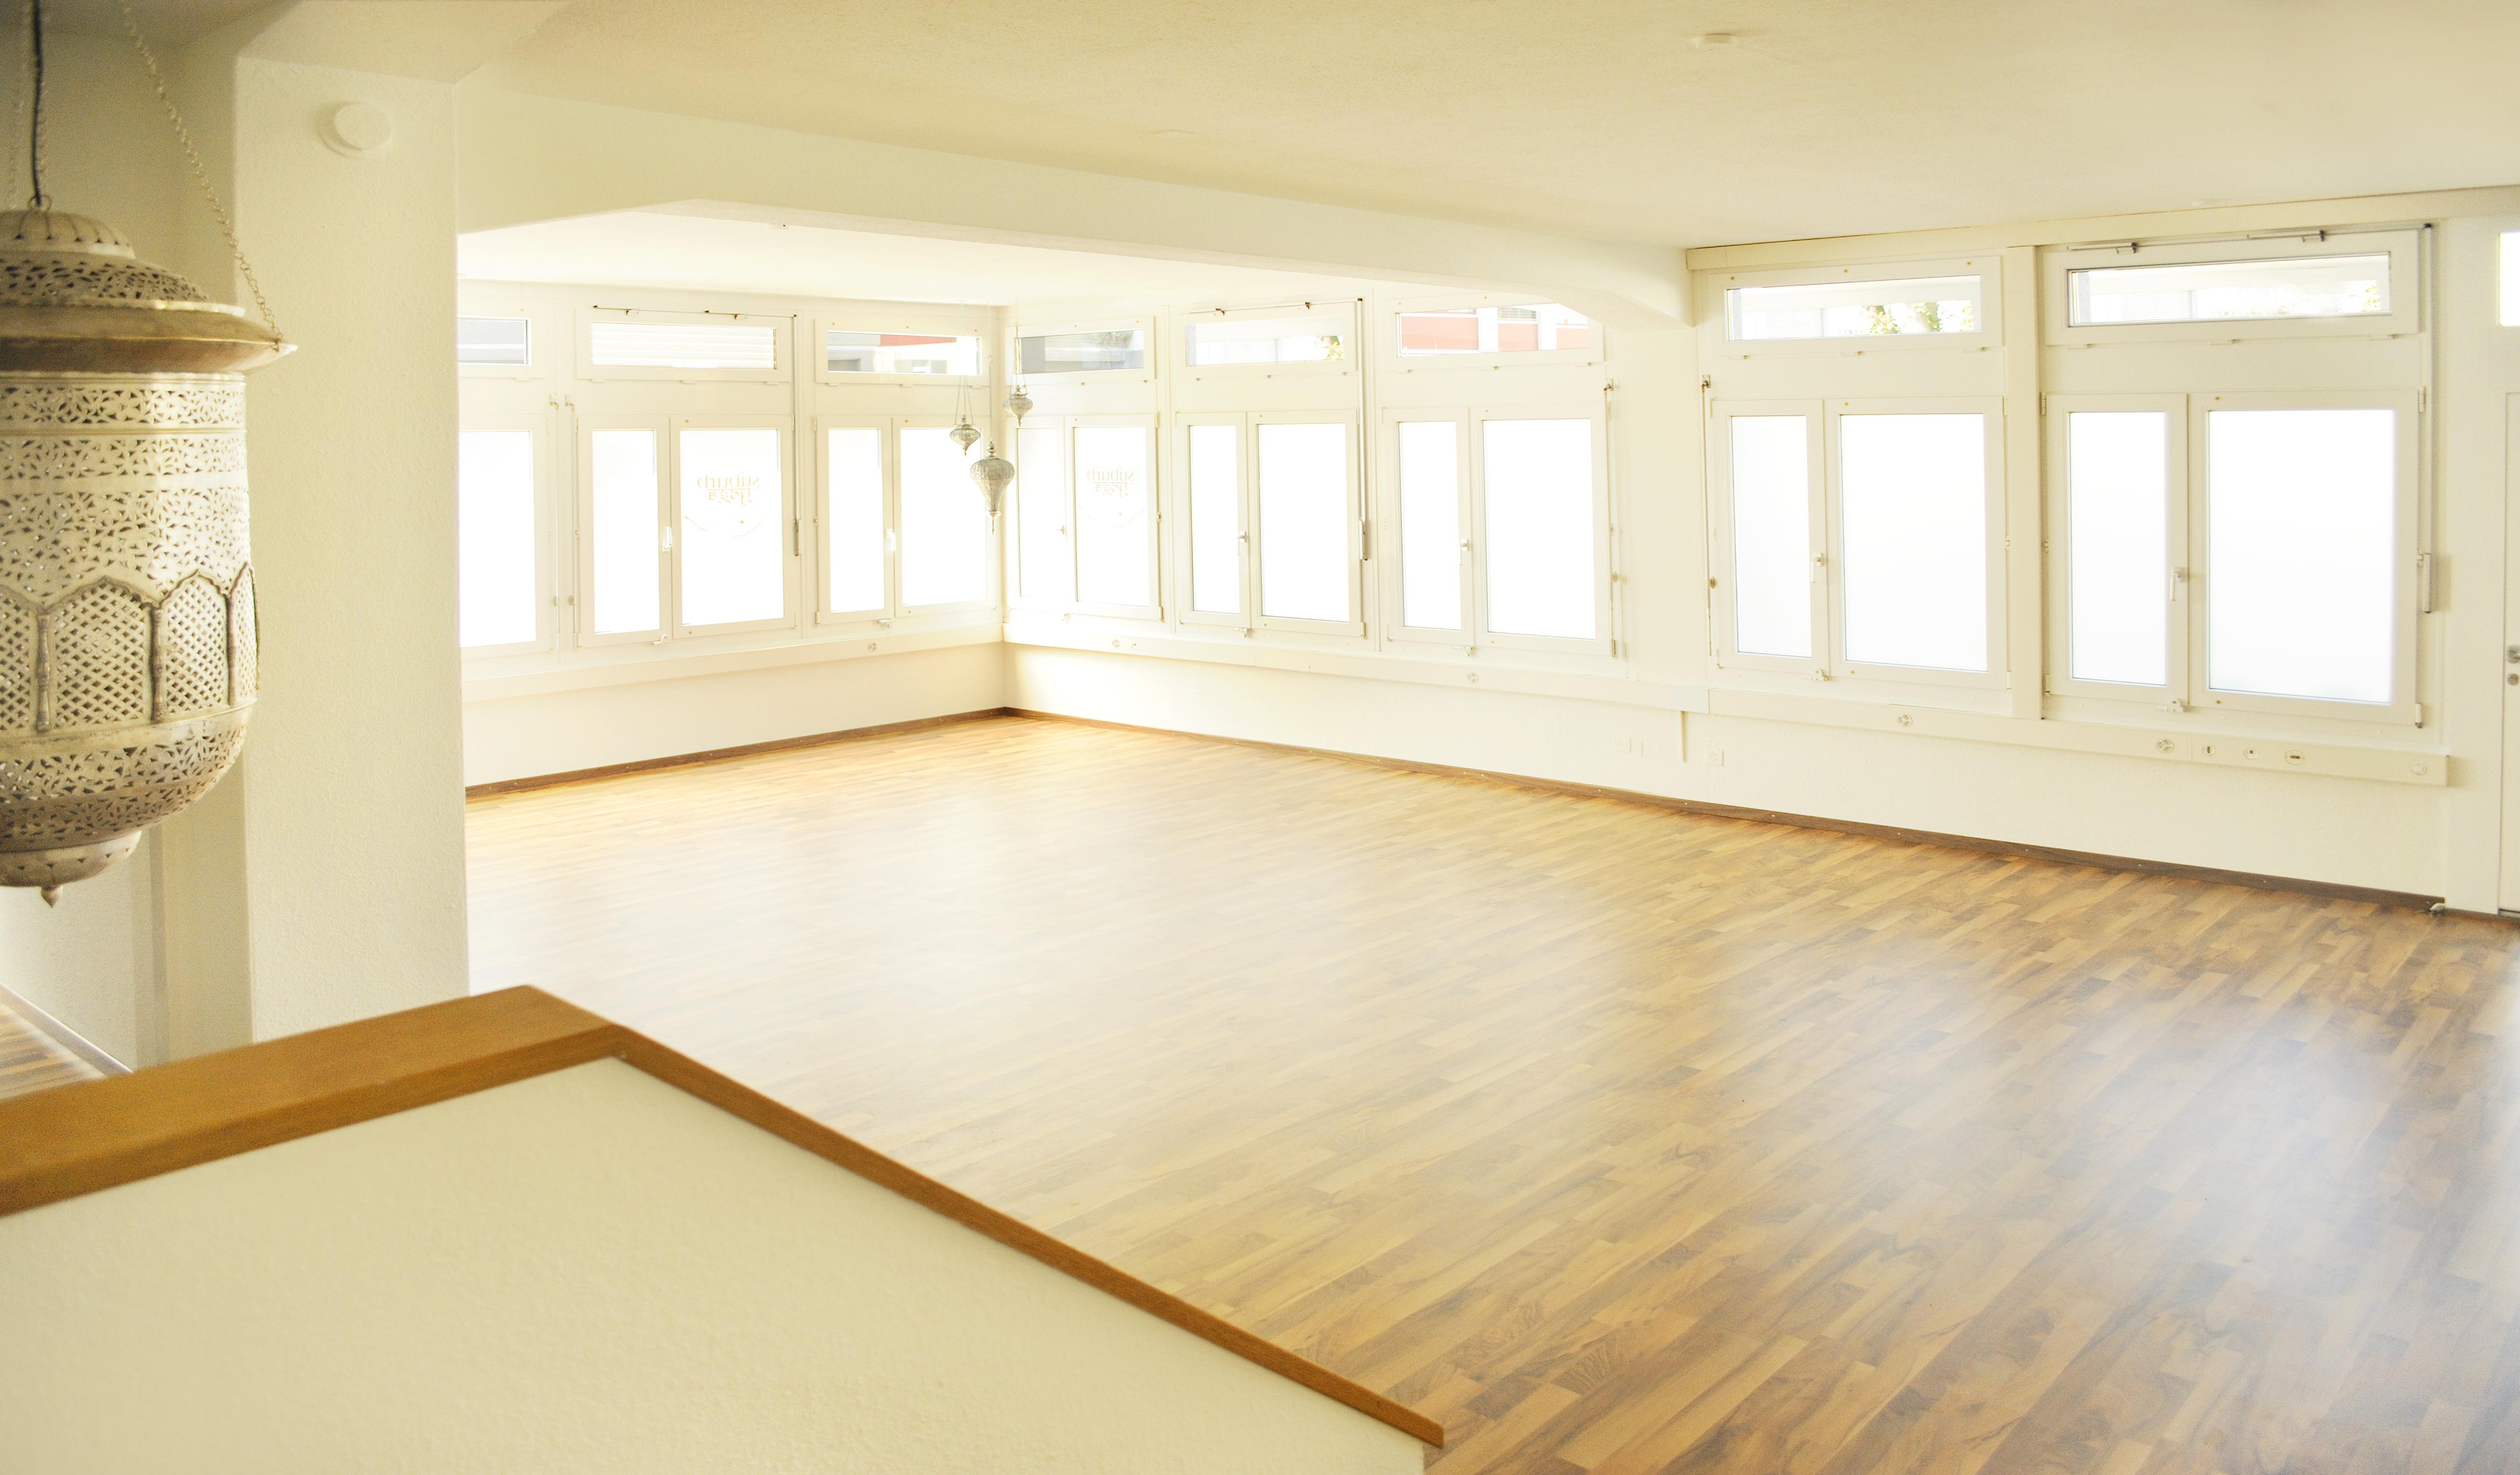 suburb yoga raum f r yoga klang meditaiton raum mieten raumvermietung. Black Bedroom Furniture Sets. Home Design Ideas